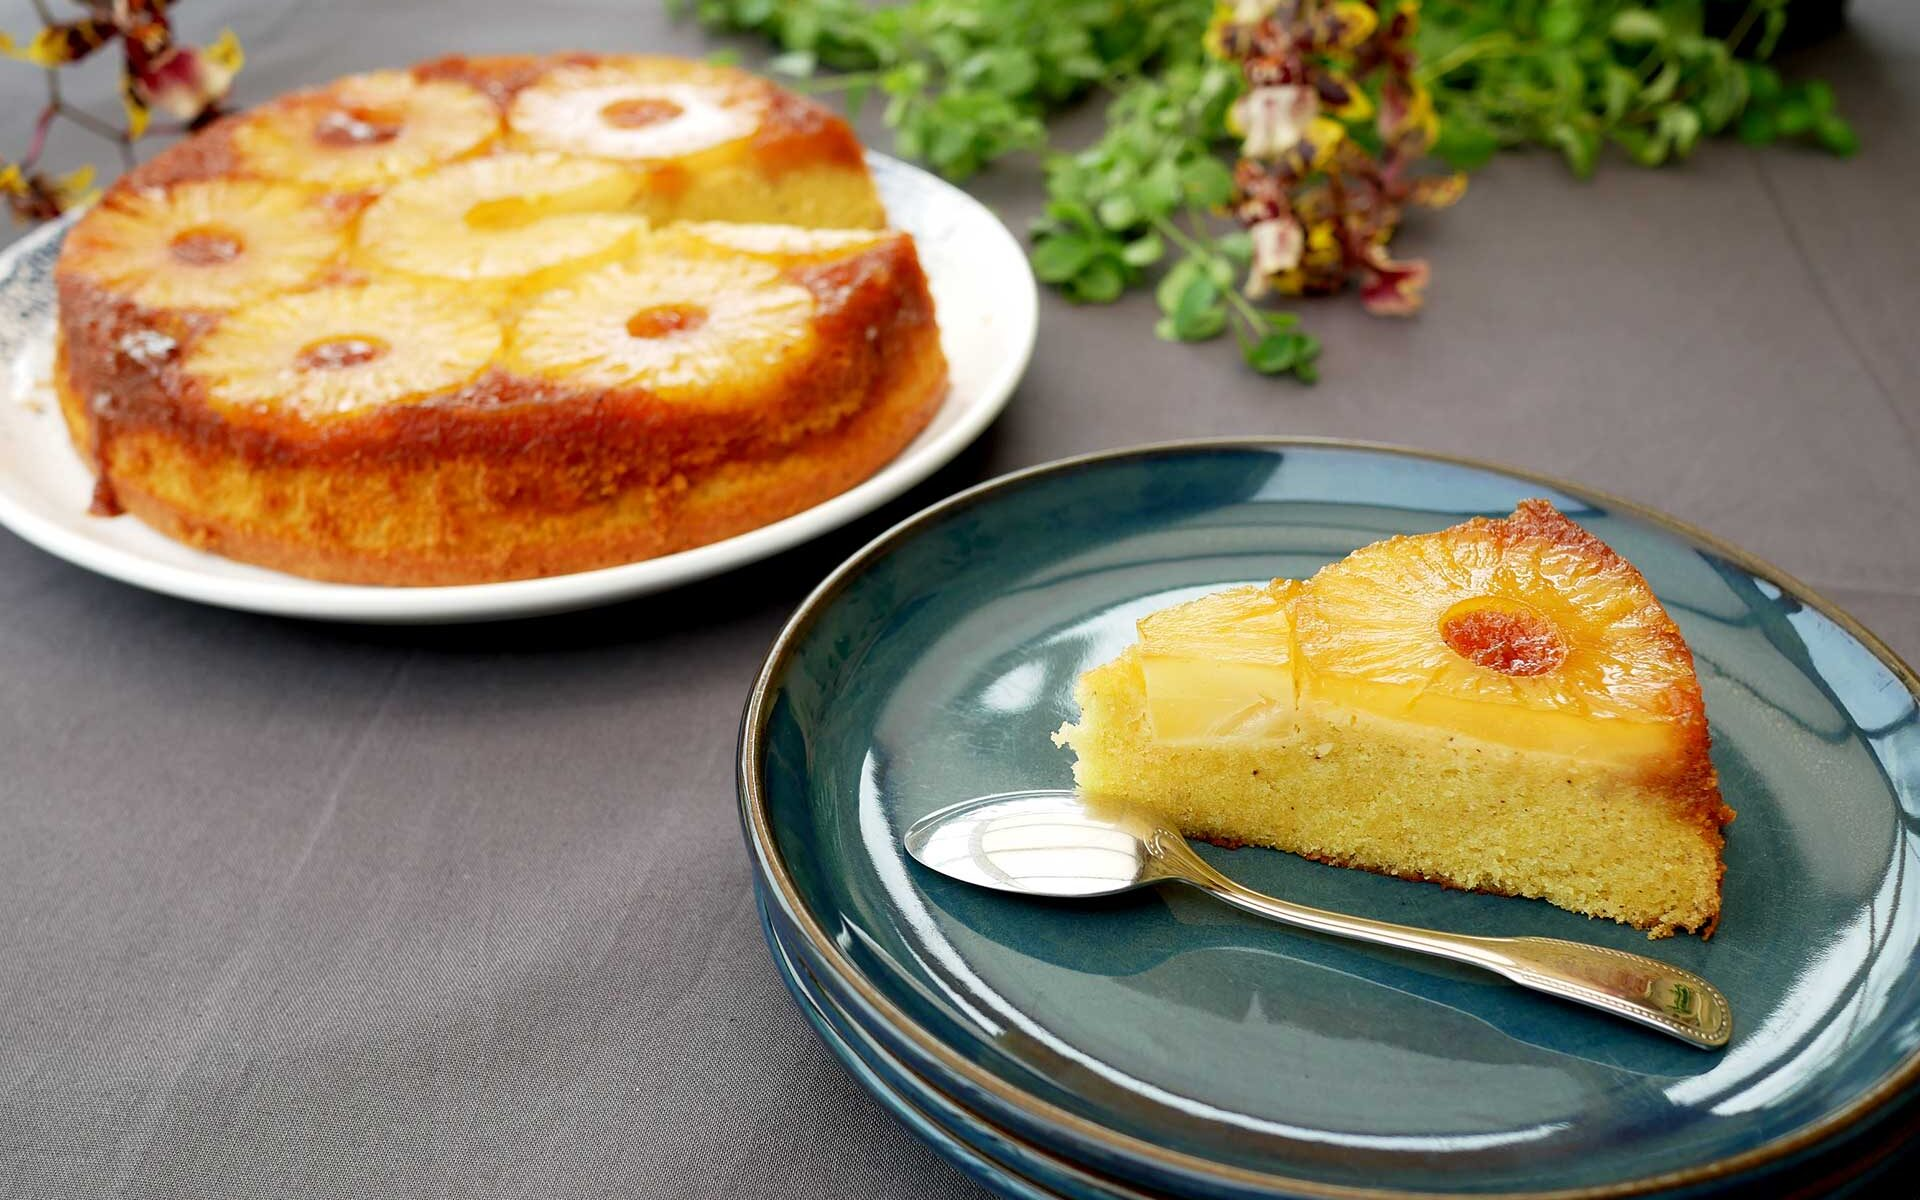 Gâteau ananas renversé